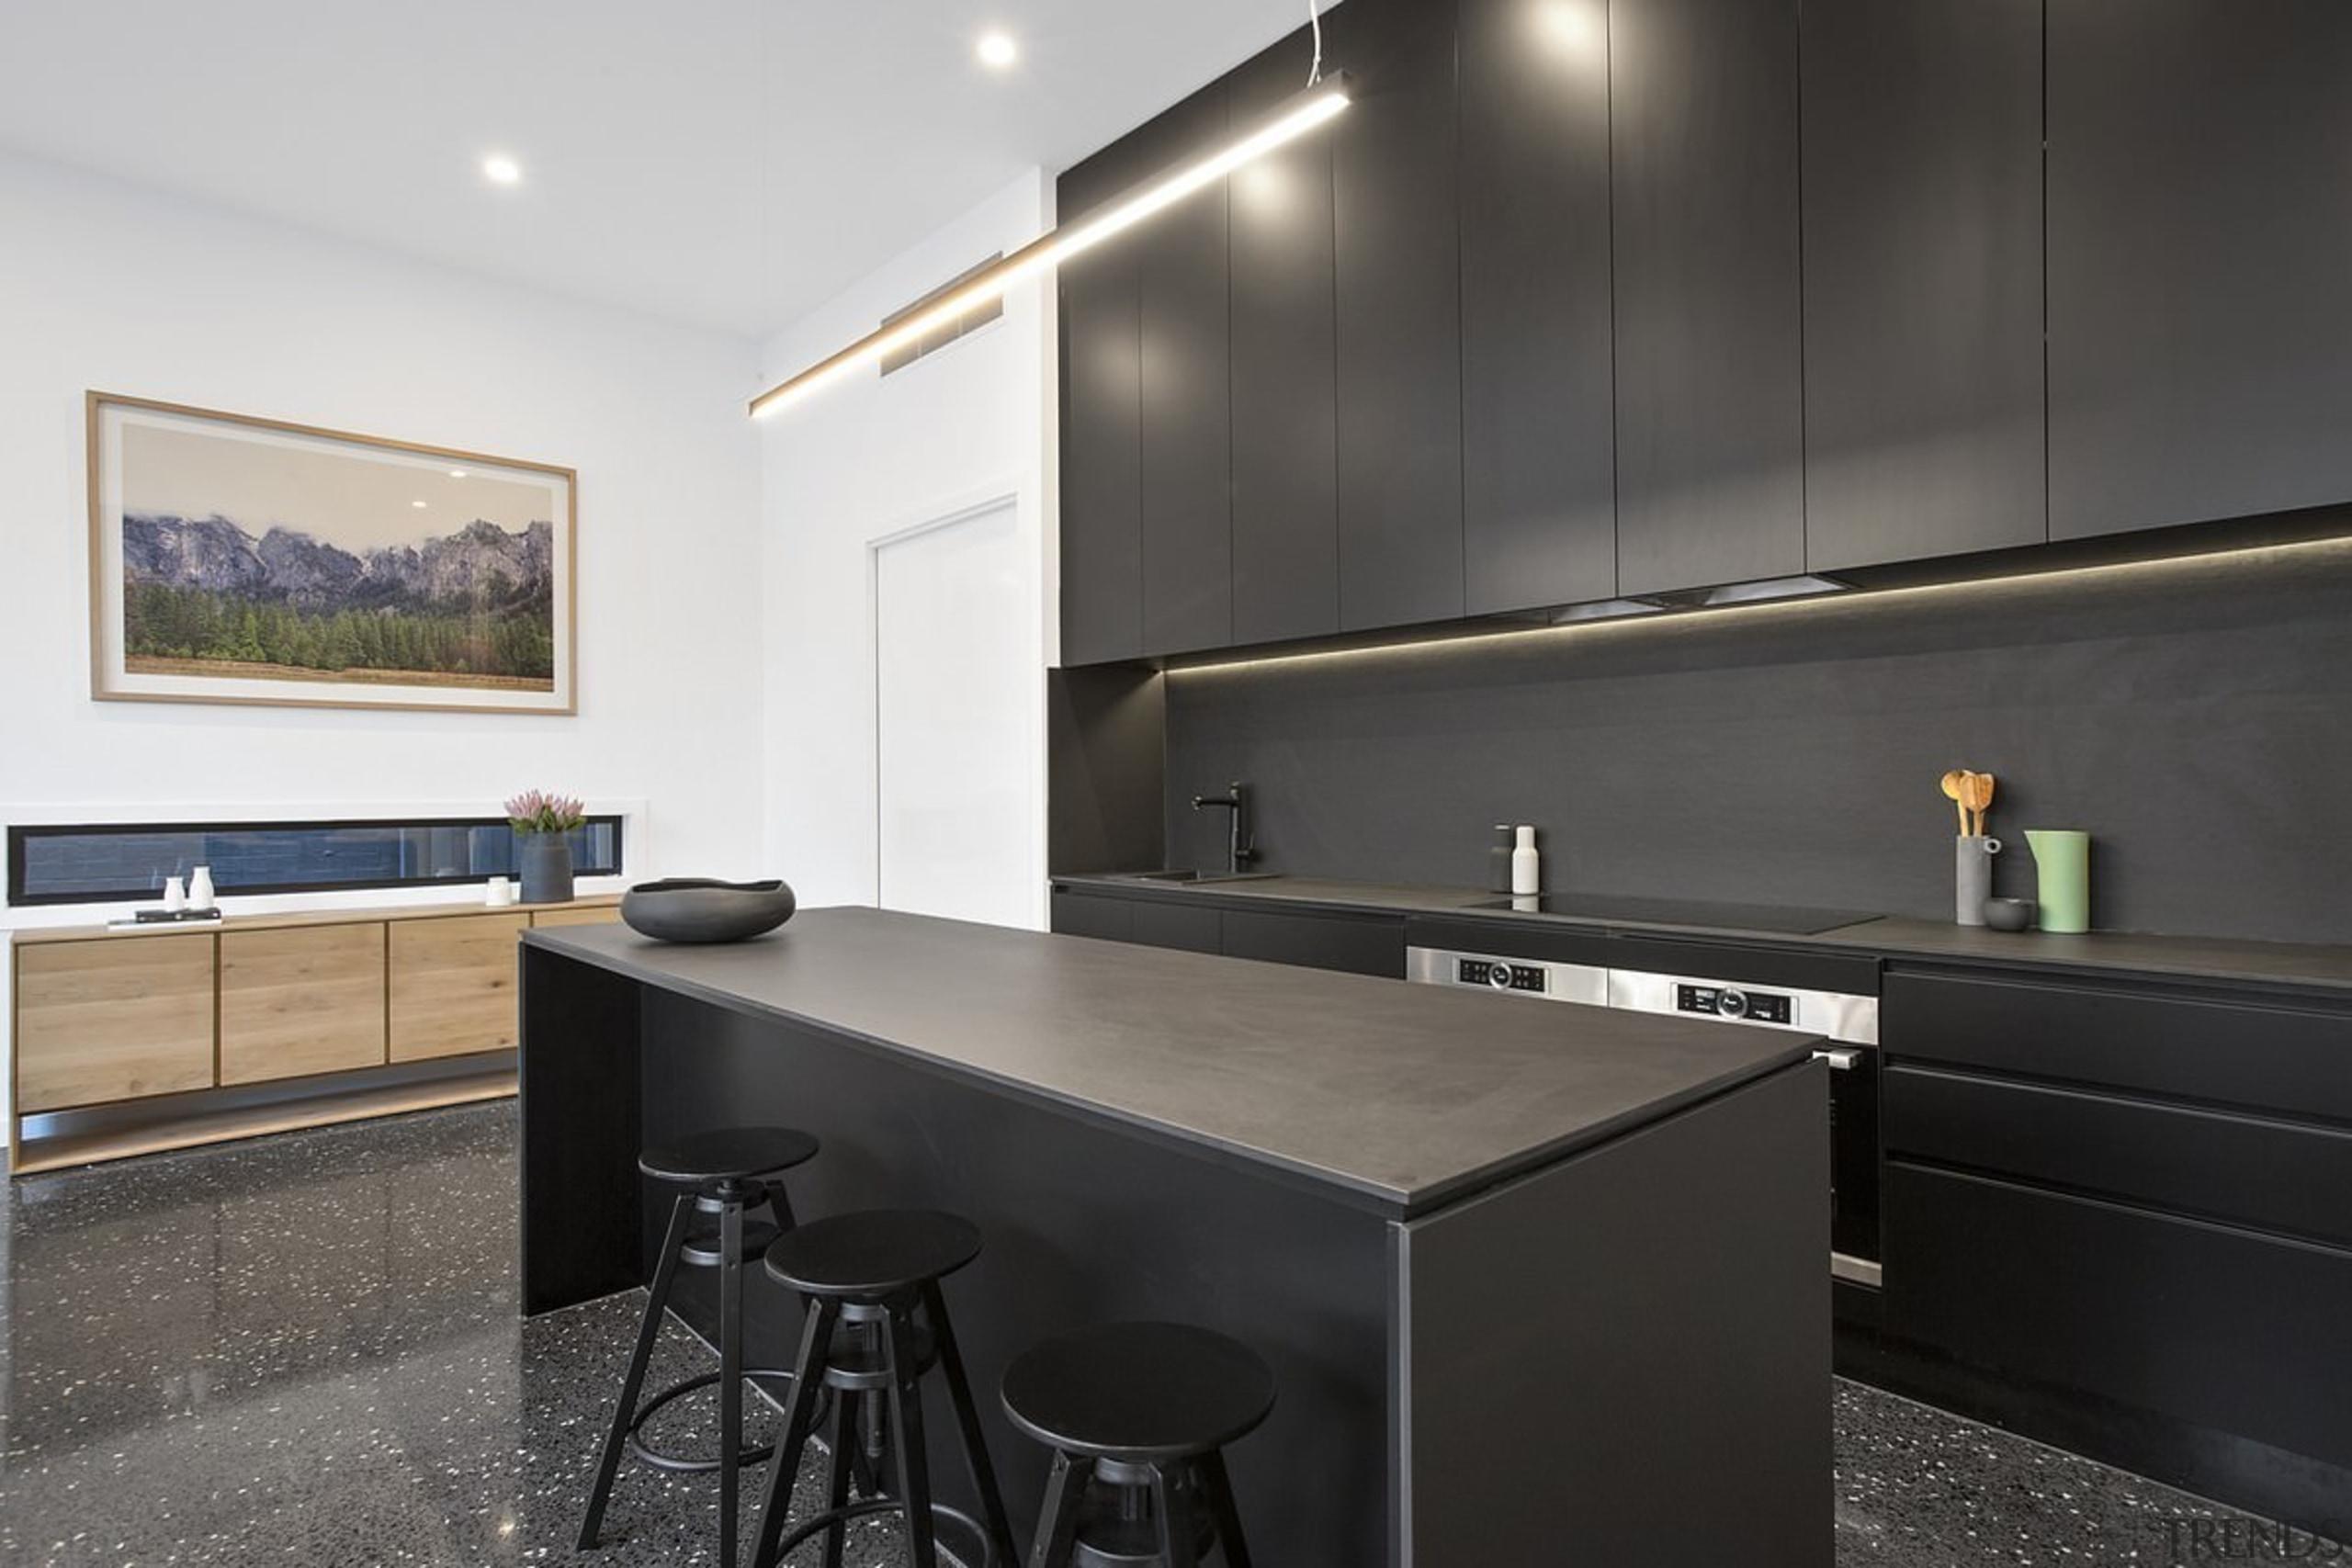 A black kitchen – cabinets and island included architecture, countertop, interior design, kitchen, real estate, black